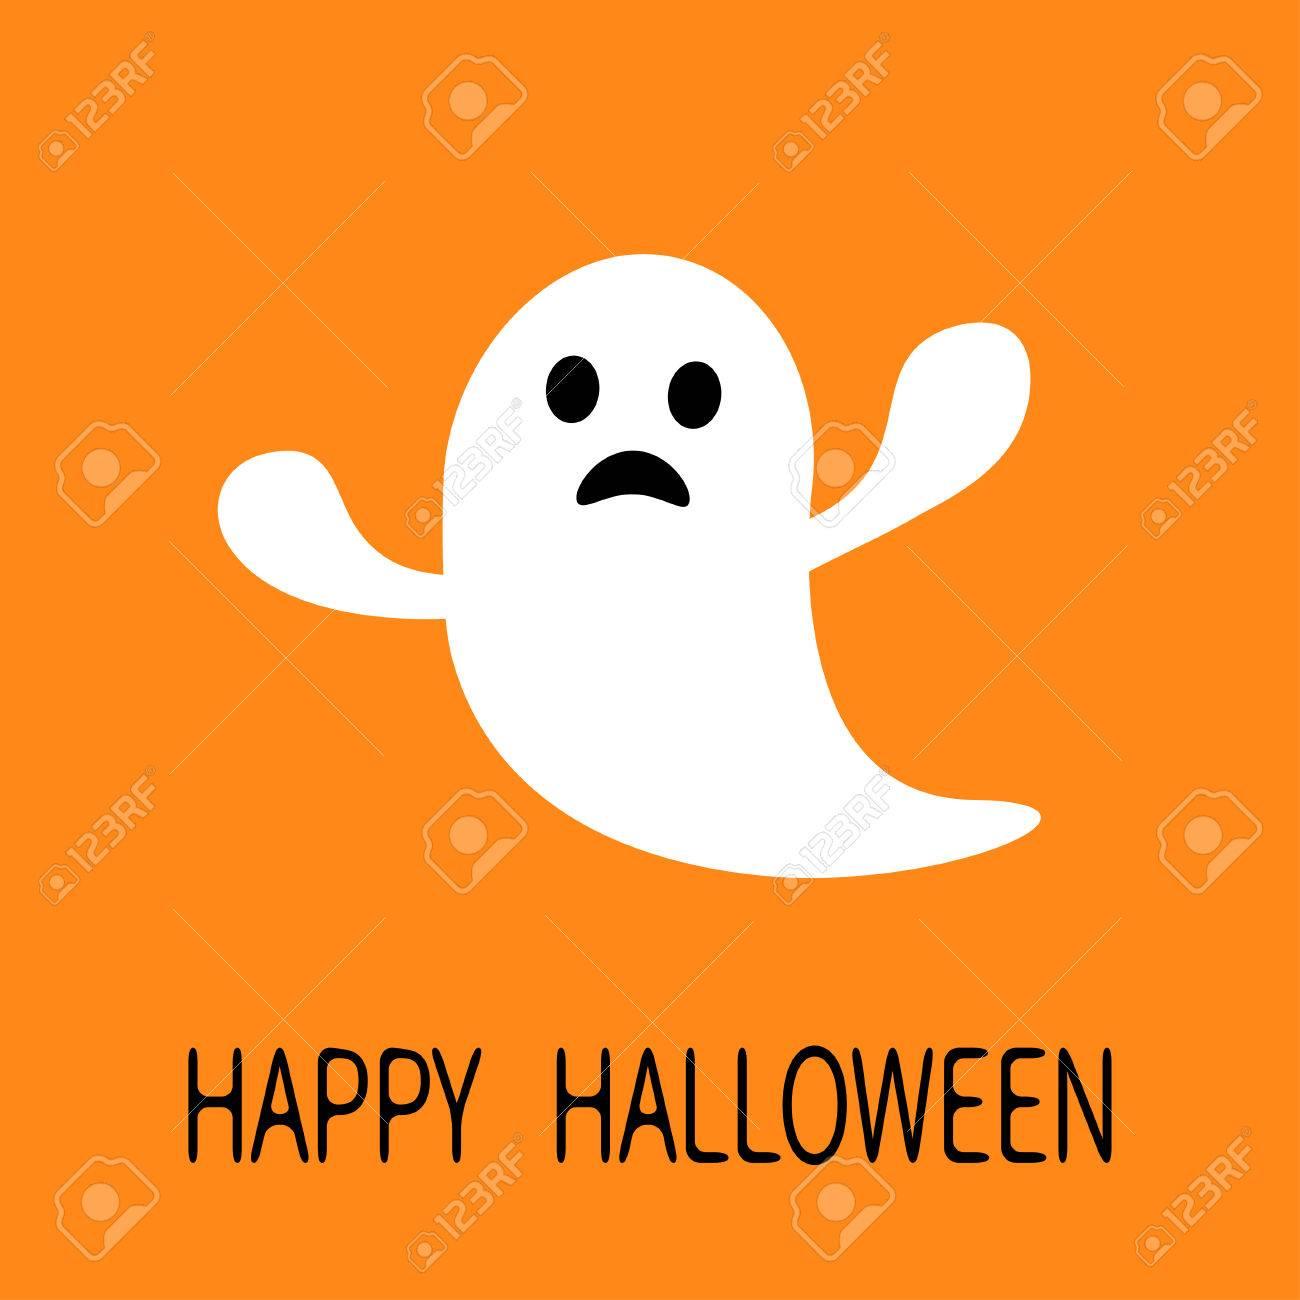 Halloween Greetings Funny Hallowen